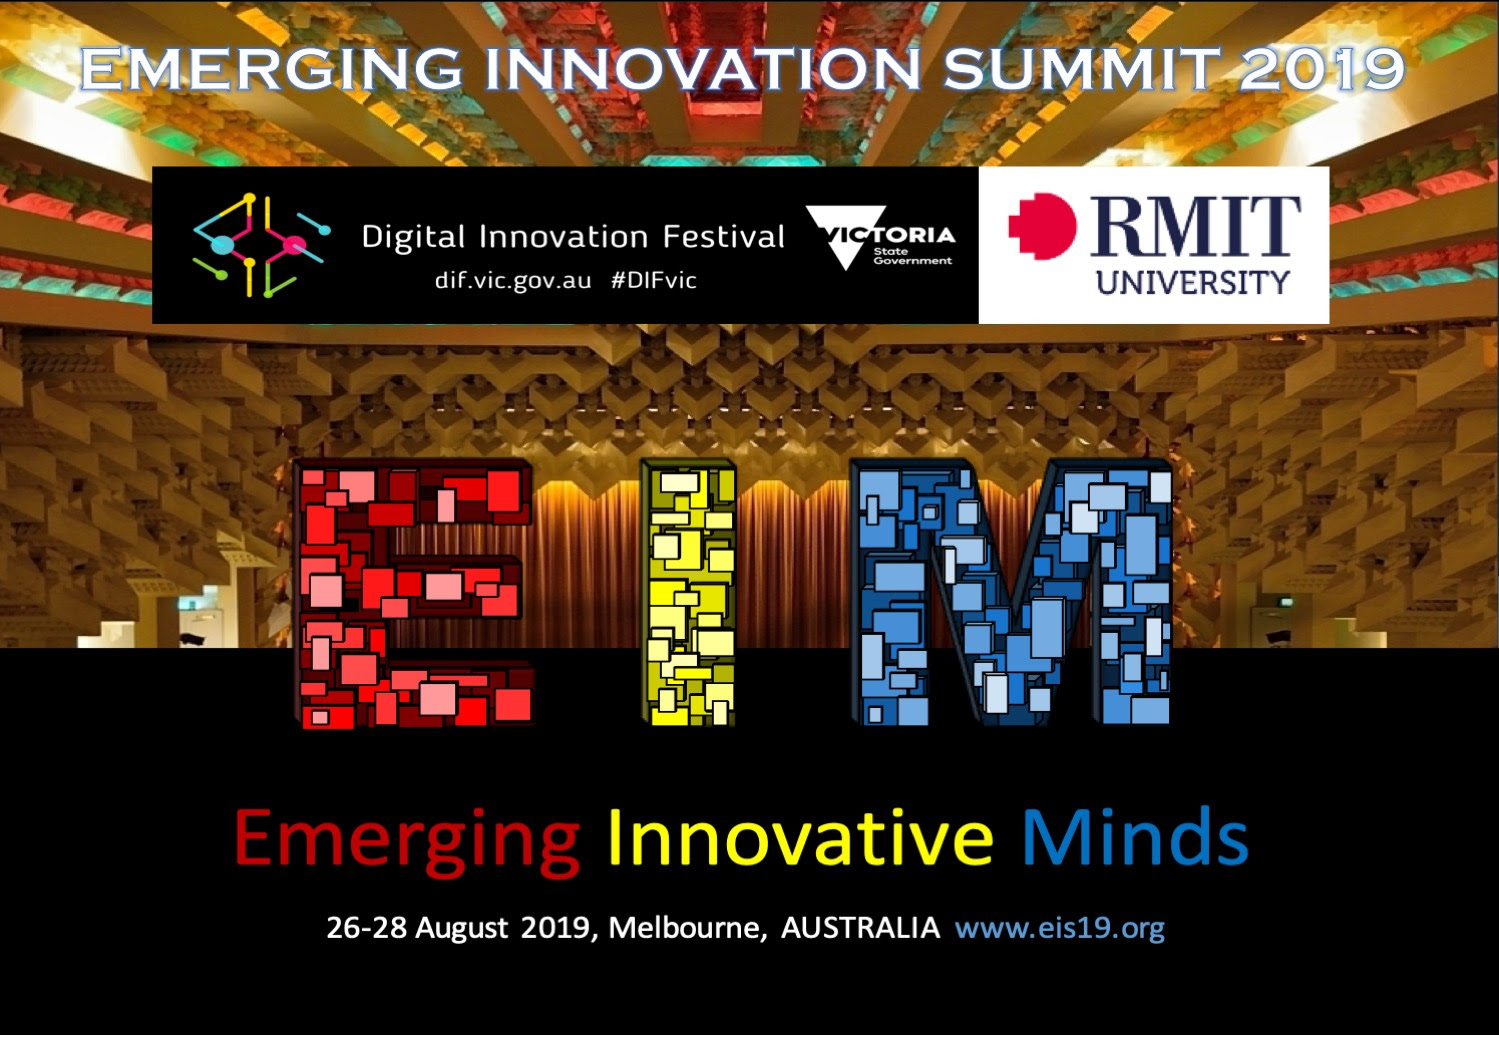 Emerging Innovation Summit 2019